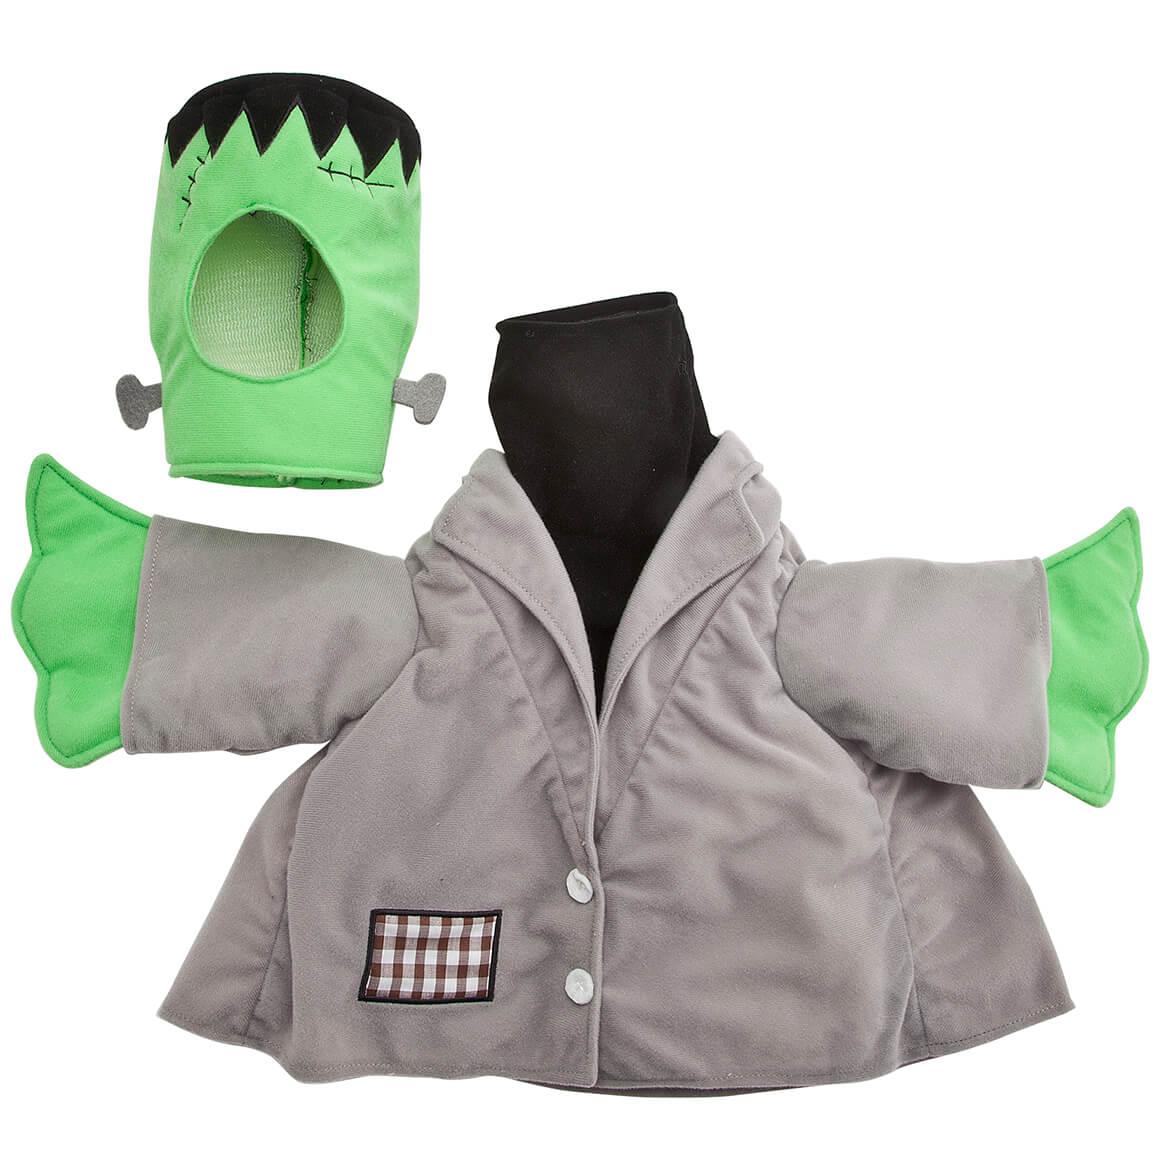 Frankenstein Goose Outfit-352265